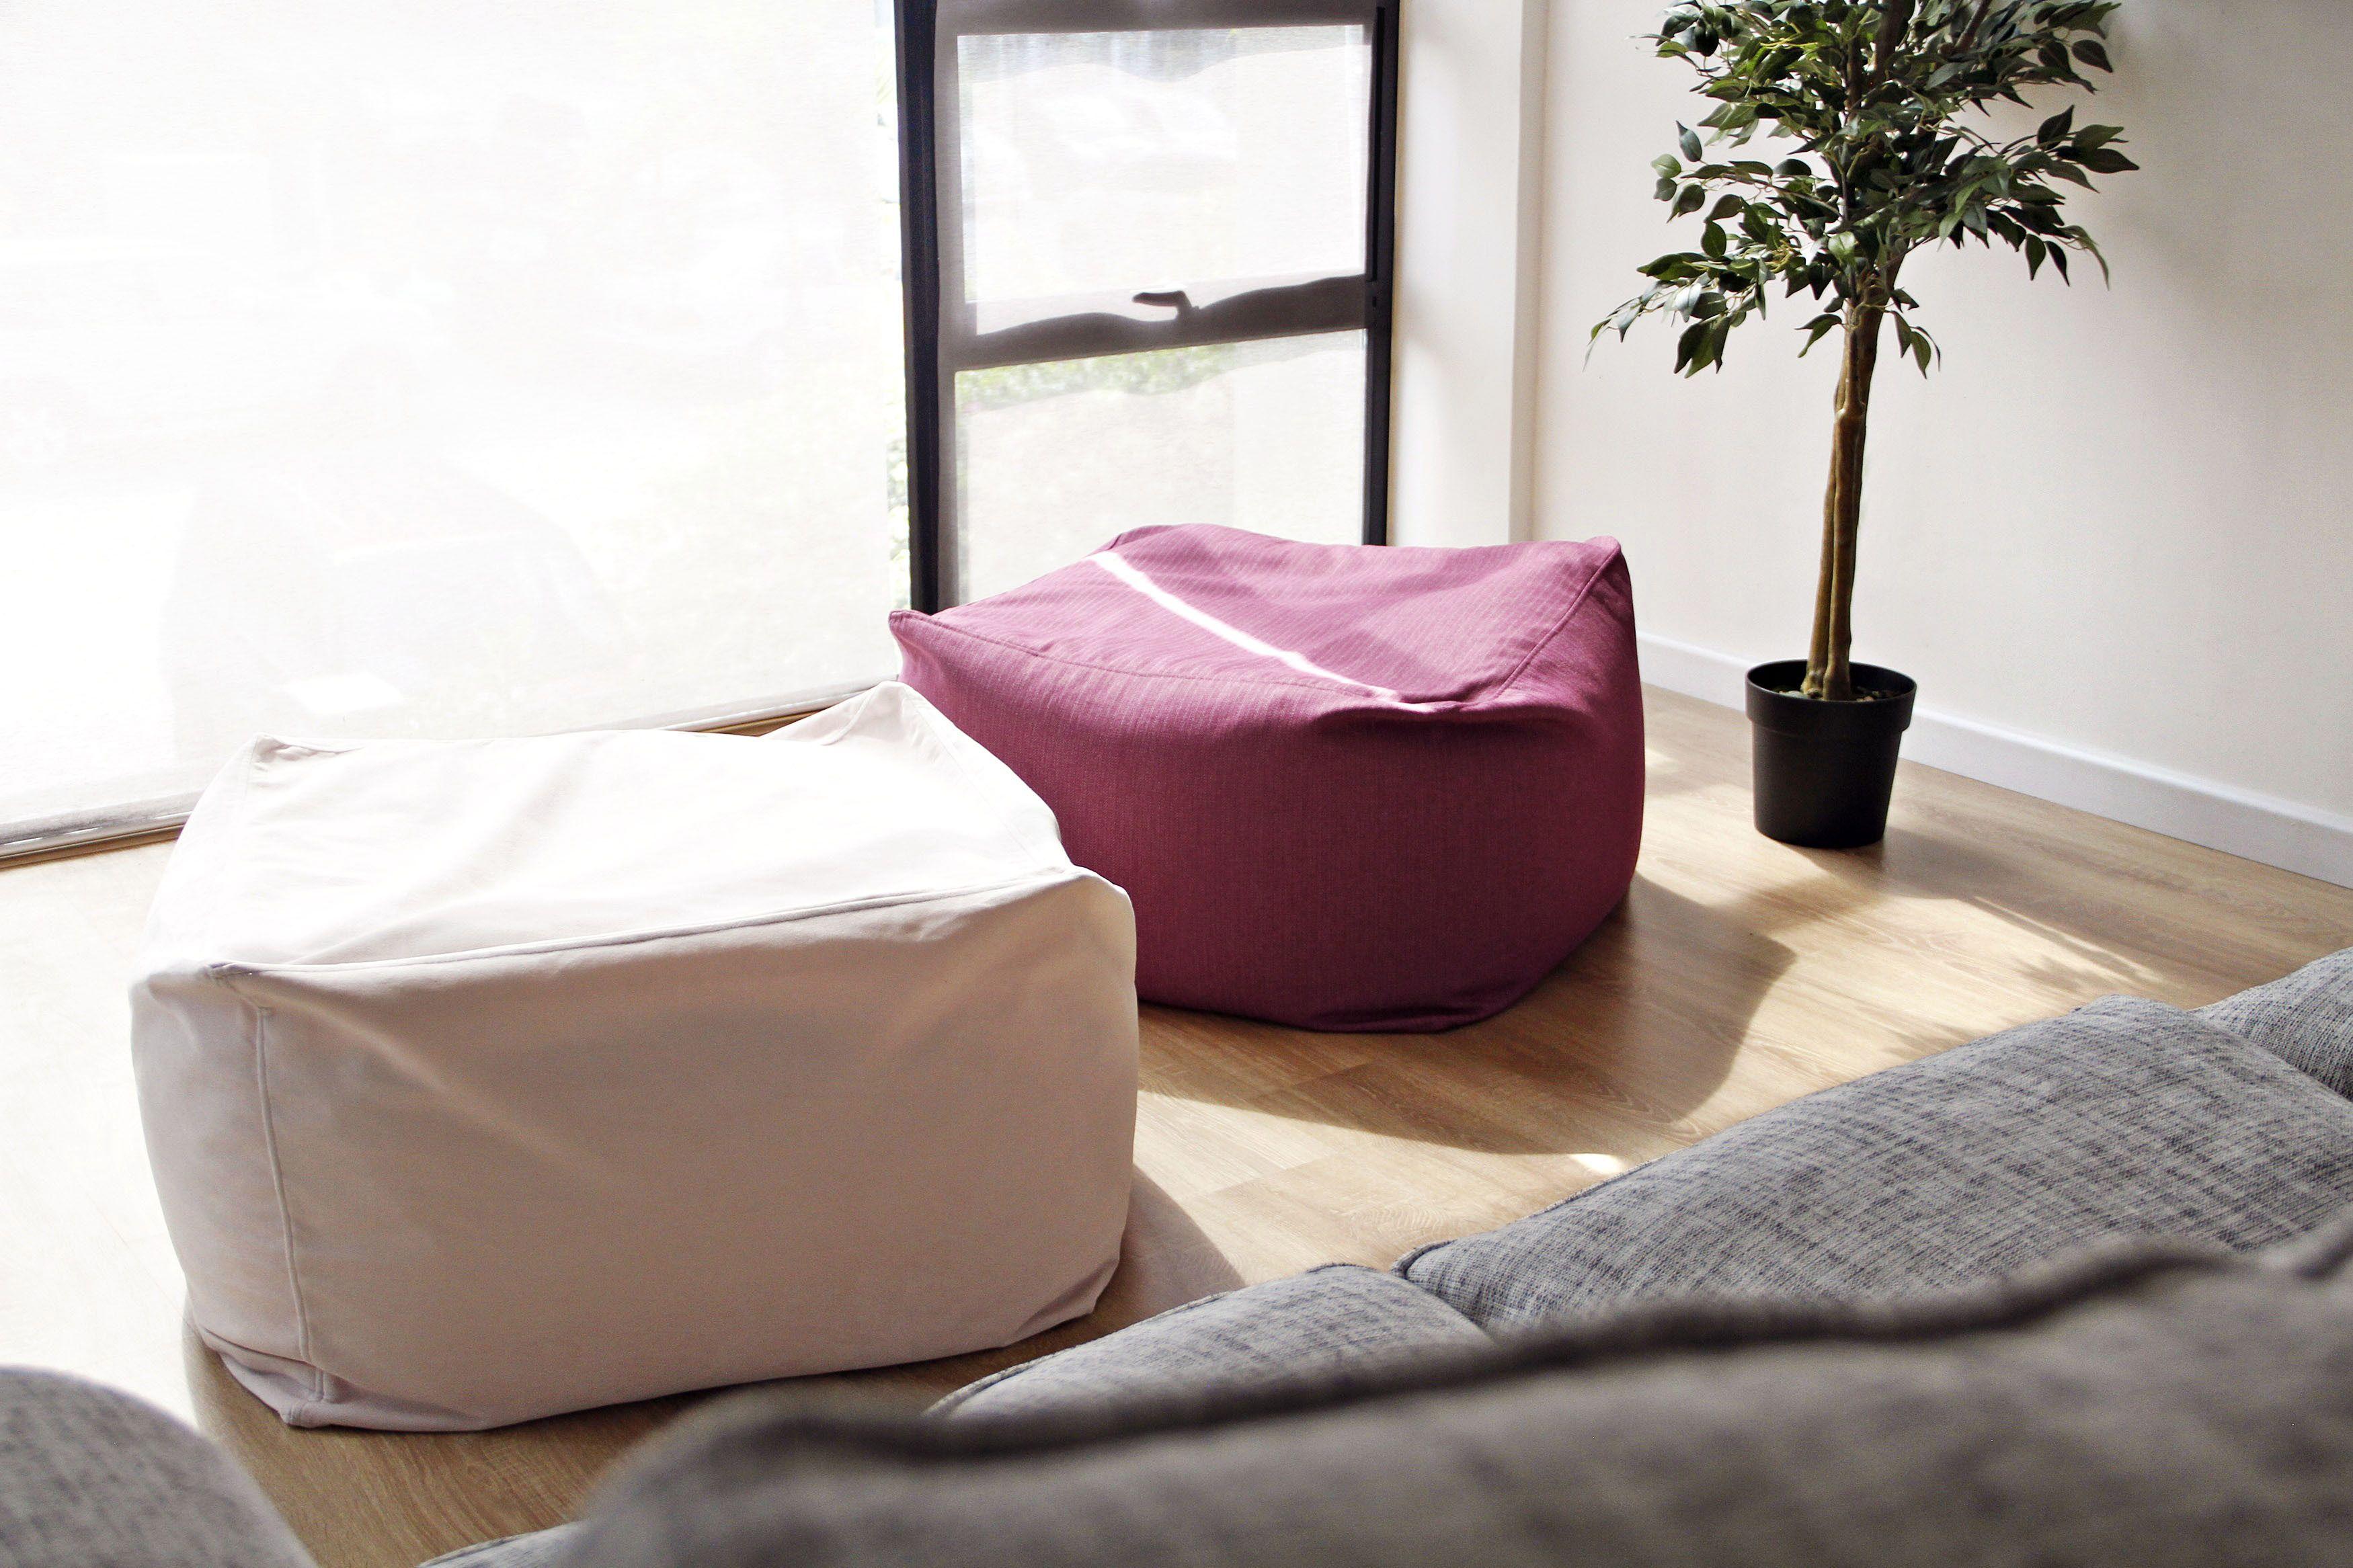 Magnificent Muji Beads Sofa Beanbag Slipcovers In Herringbone Magenta Onthecornerstone Fun Painted Chair Ideas Images Onthecornerstoneorg